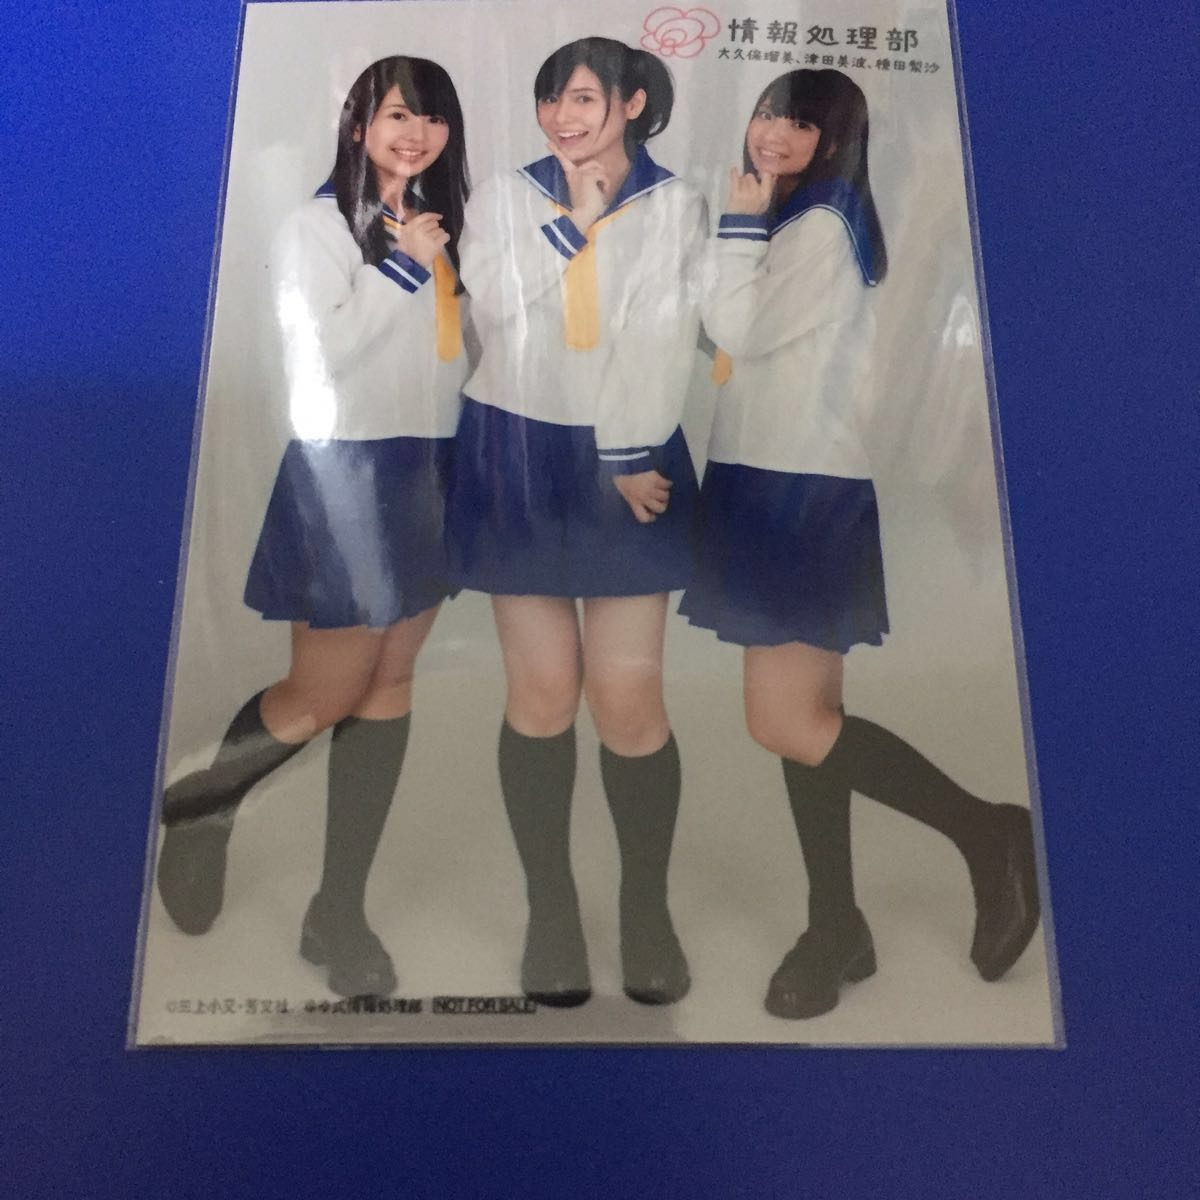 HMV ゆゆ式 ブロマイド 情報処理部 津田美波 大久保瑠美 種田梨沙